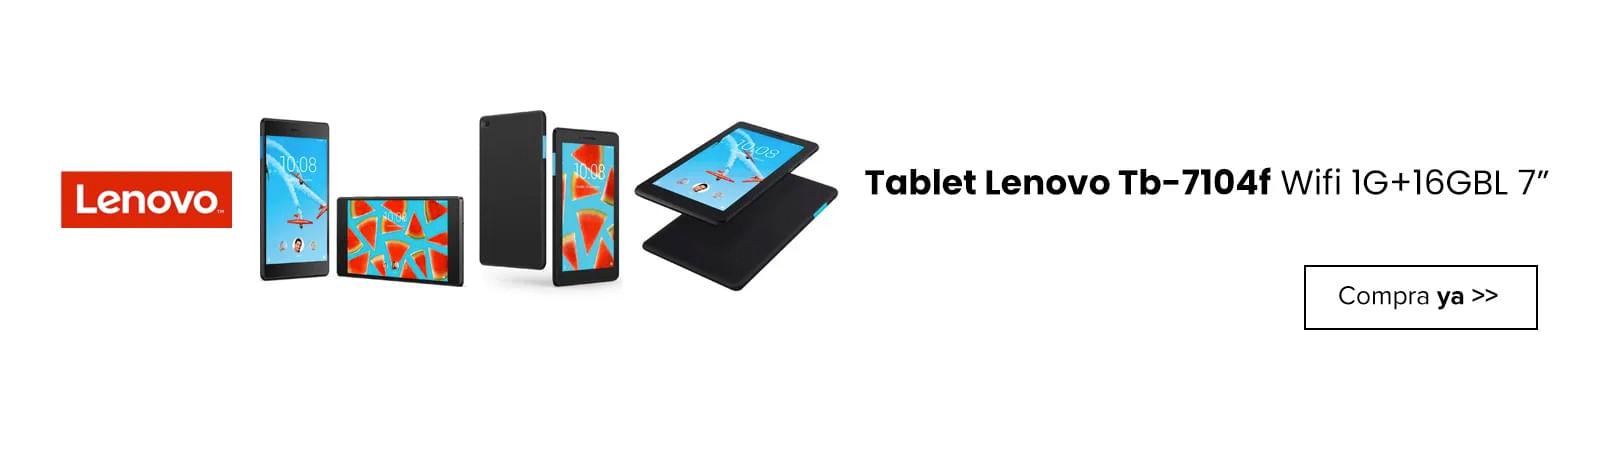 Tablet-Lenovo-Tb-7104f